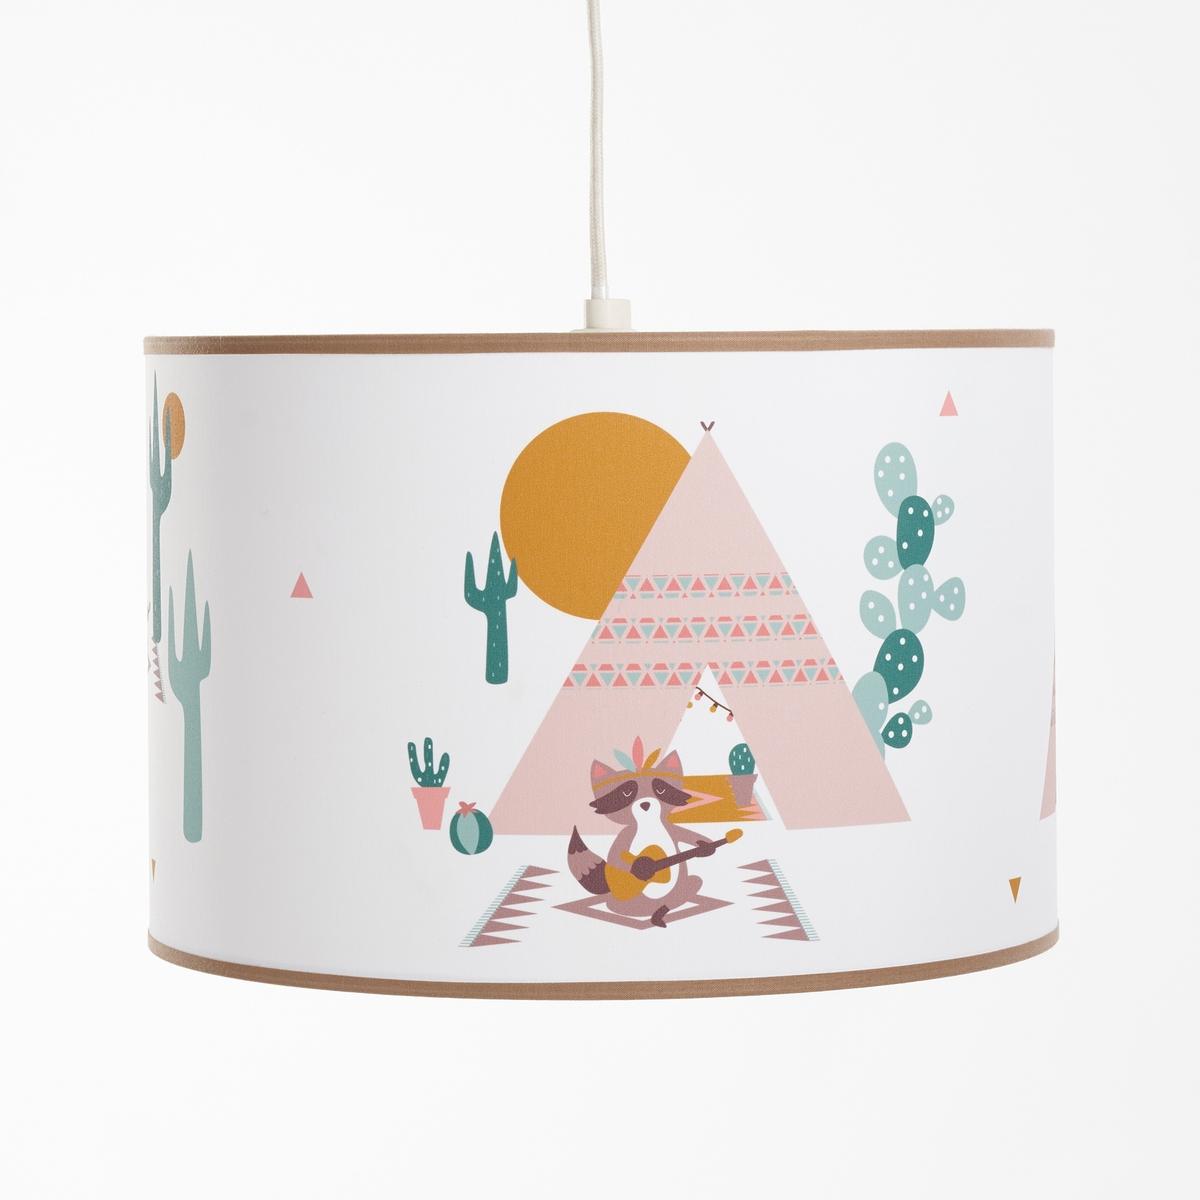 Светильник-абажур La Redoute LOUB единый размер разноцветный абажур la redoute с зигзагообразным узором wombat диаметр 35 см бежевый